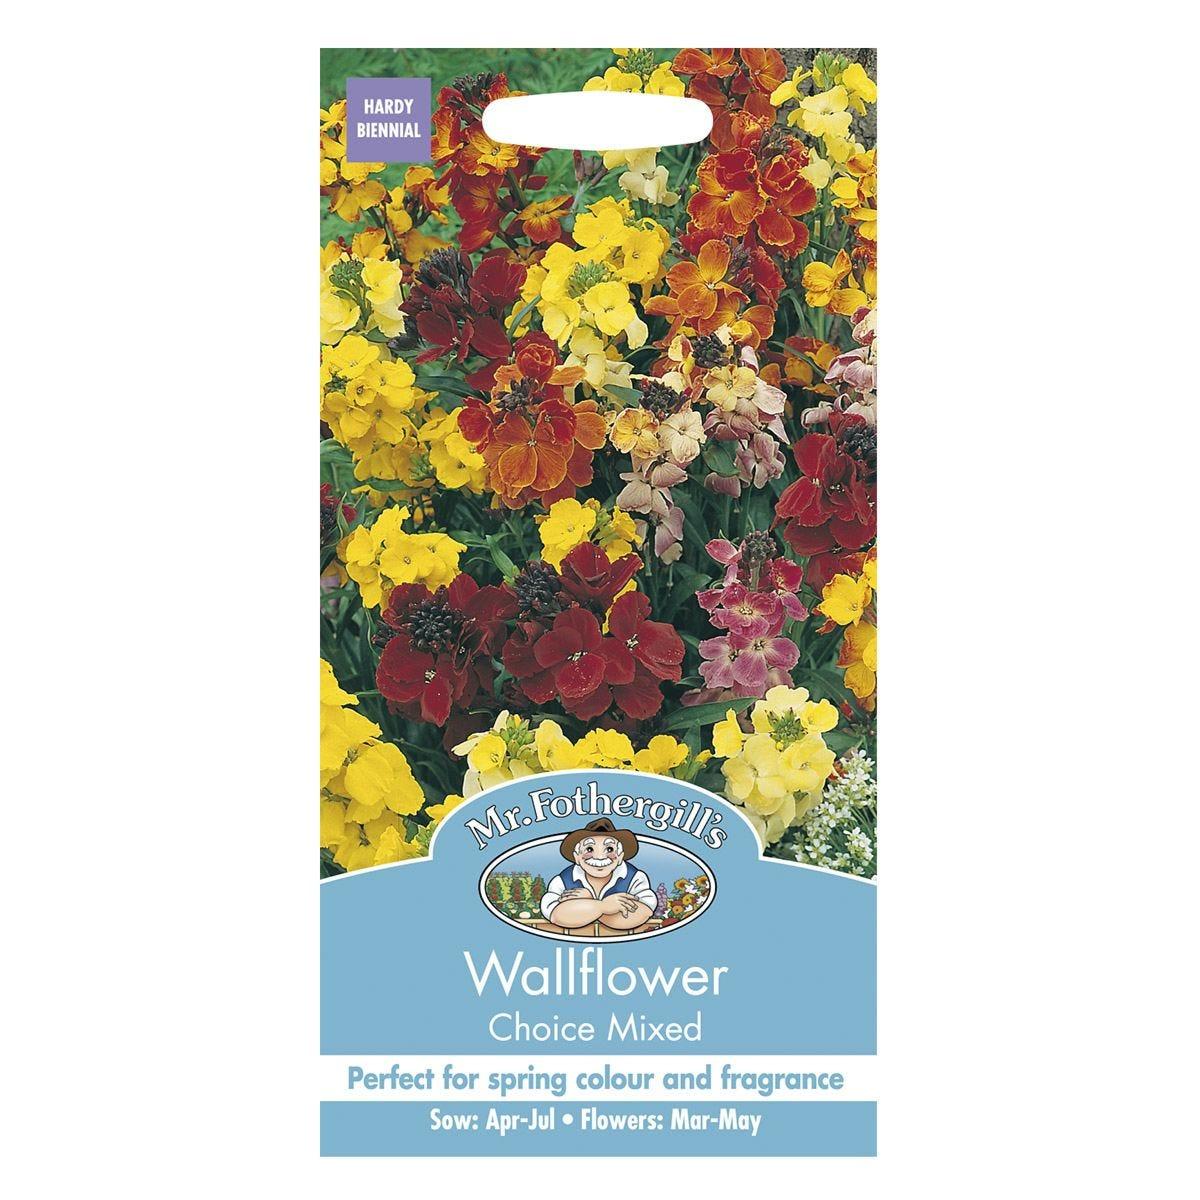 Mr Fothergill's Wallflower Choice Mixed Seeds